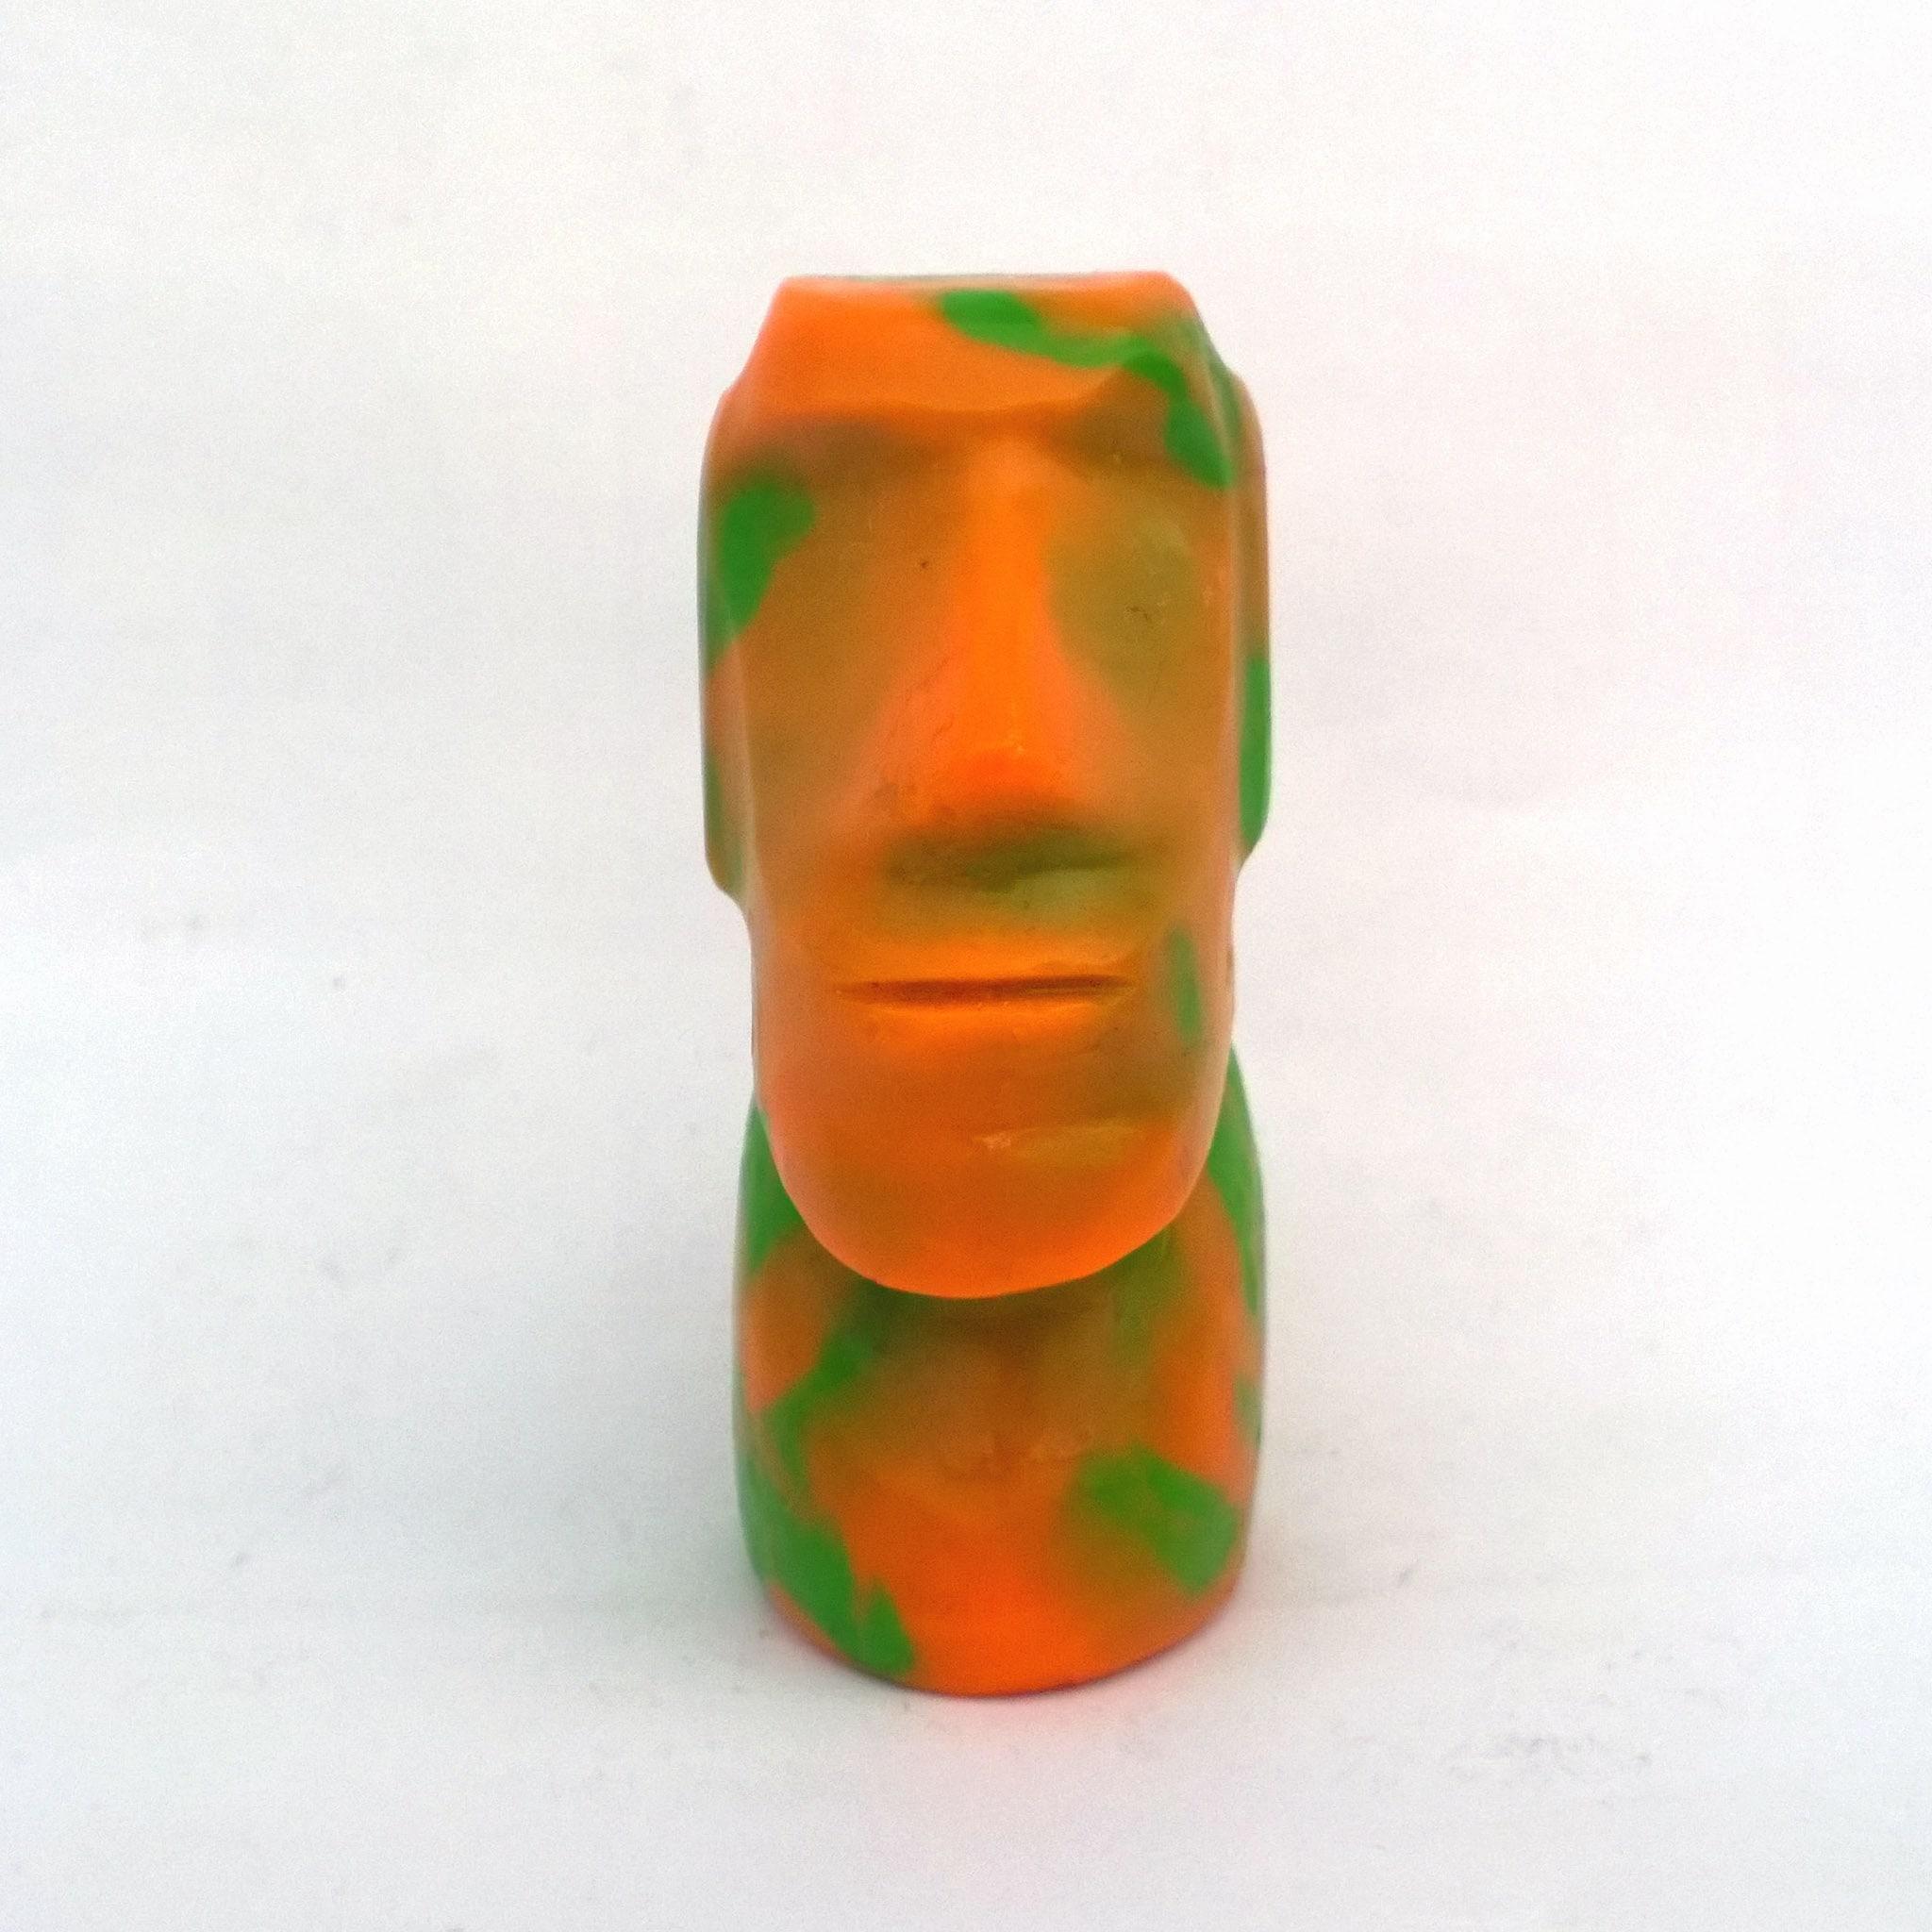 Moai Camote Toys Art Toys Resina